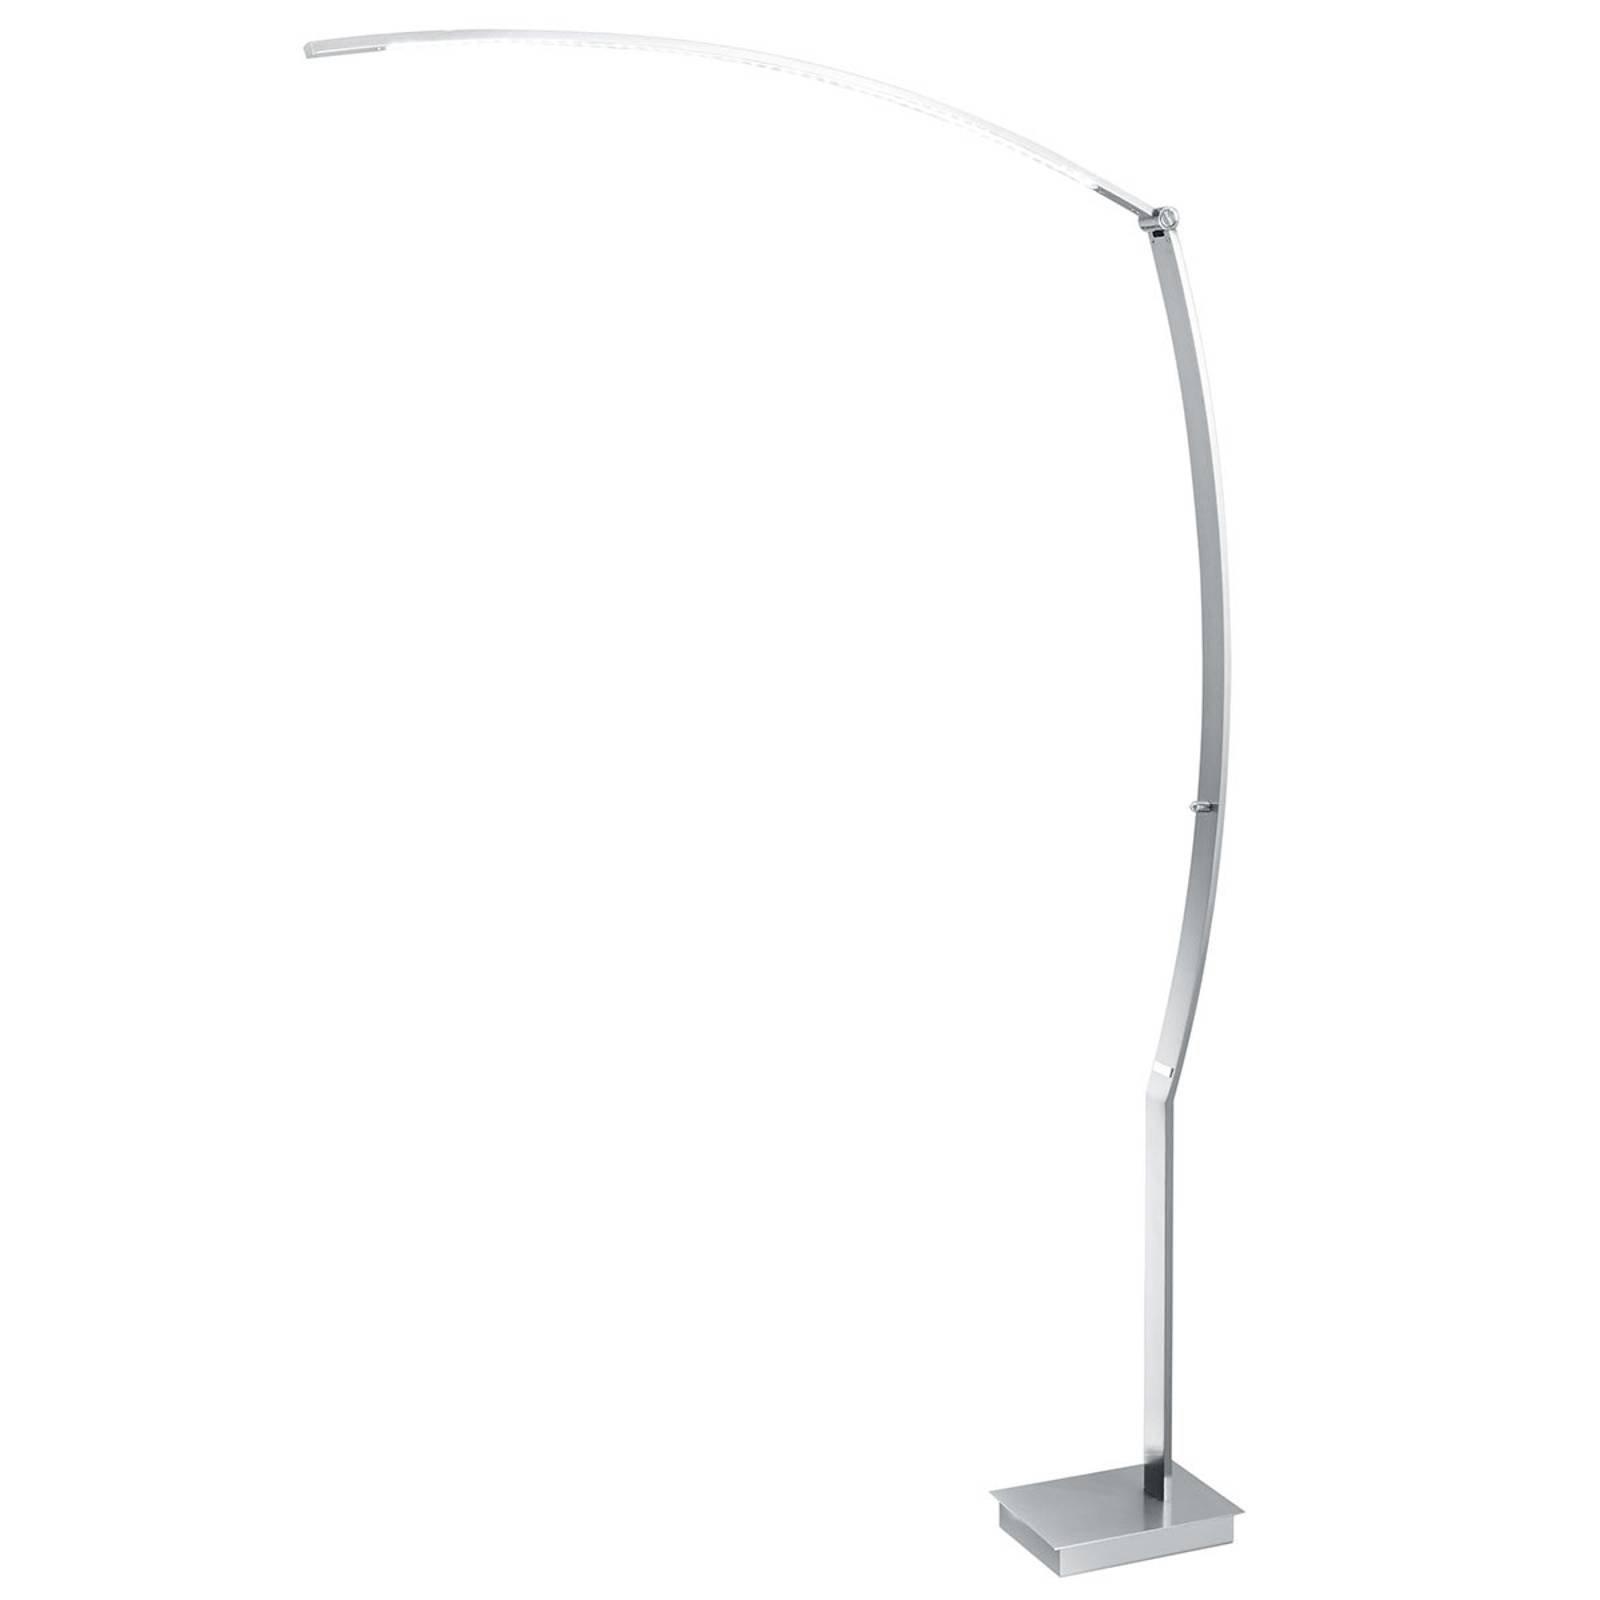 B-Leuchten New Tree LED-gulvlampe foldbar 137 cm